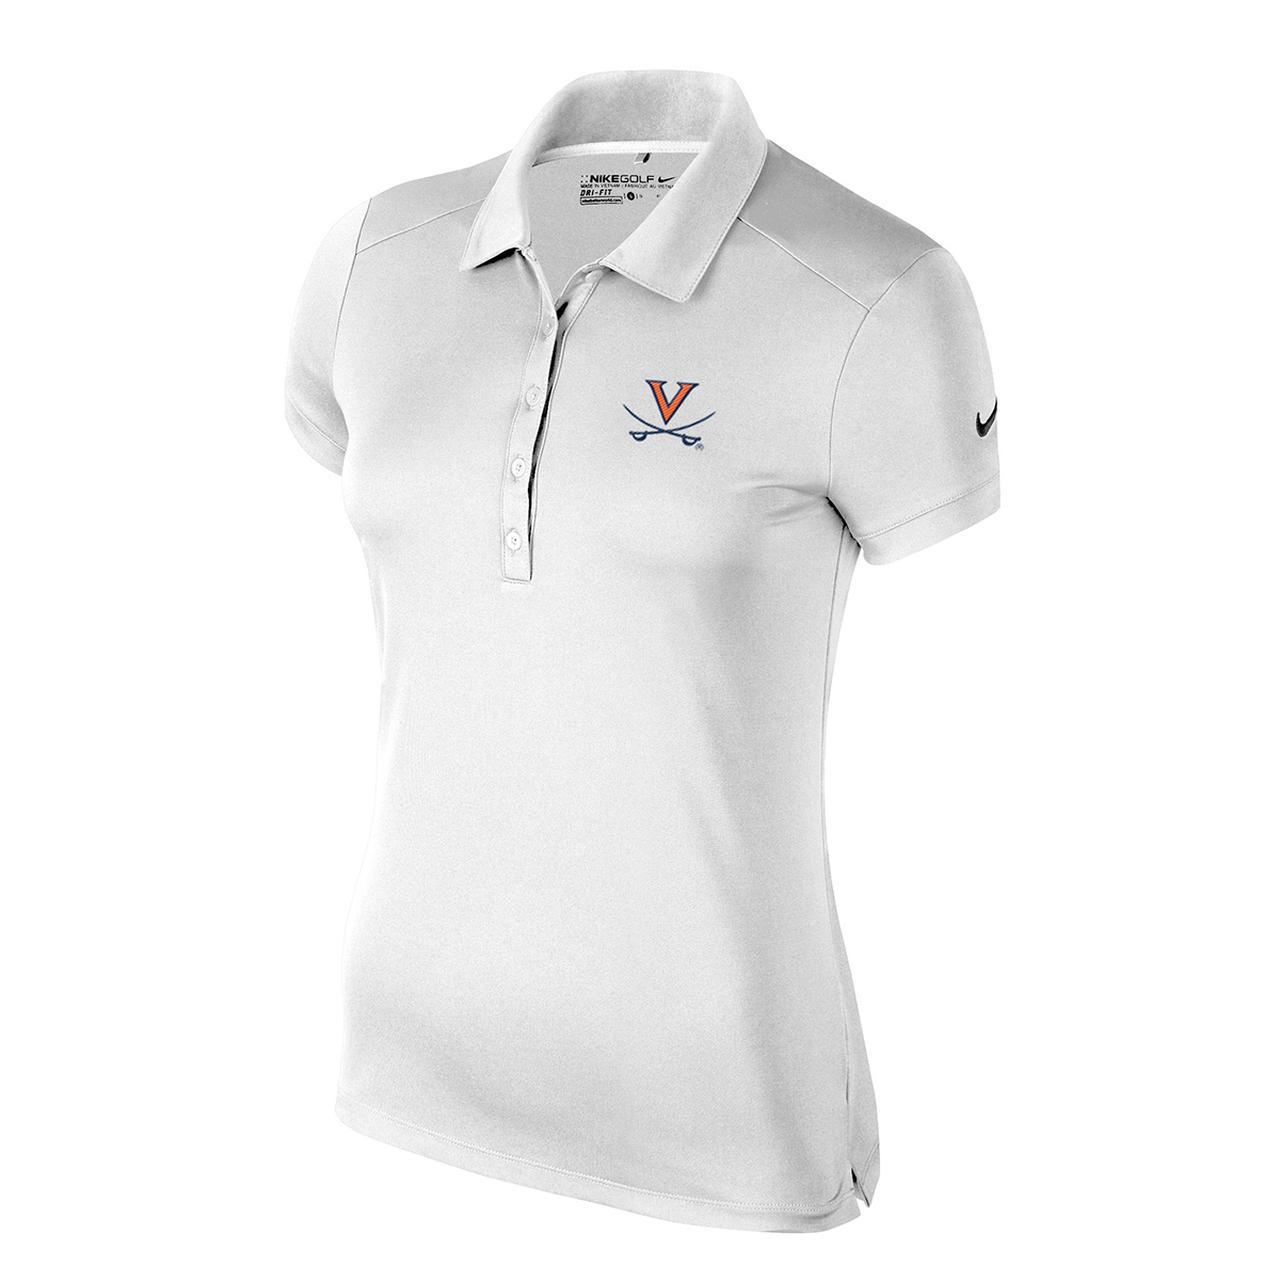 b9ff8ded UVA Athletics University of Virginia Ladies Victory Solid Polo